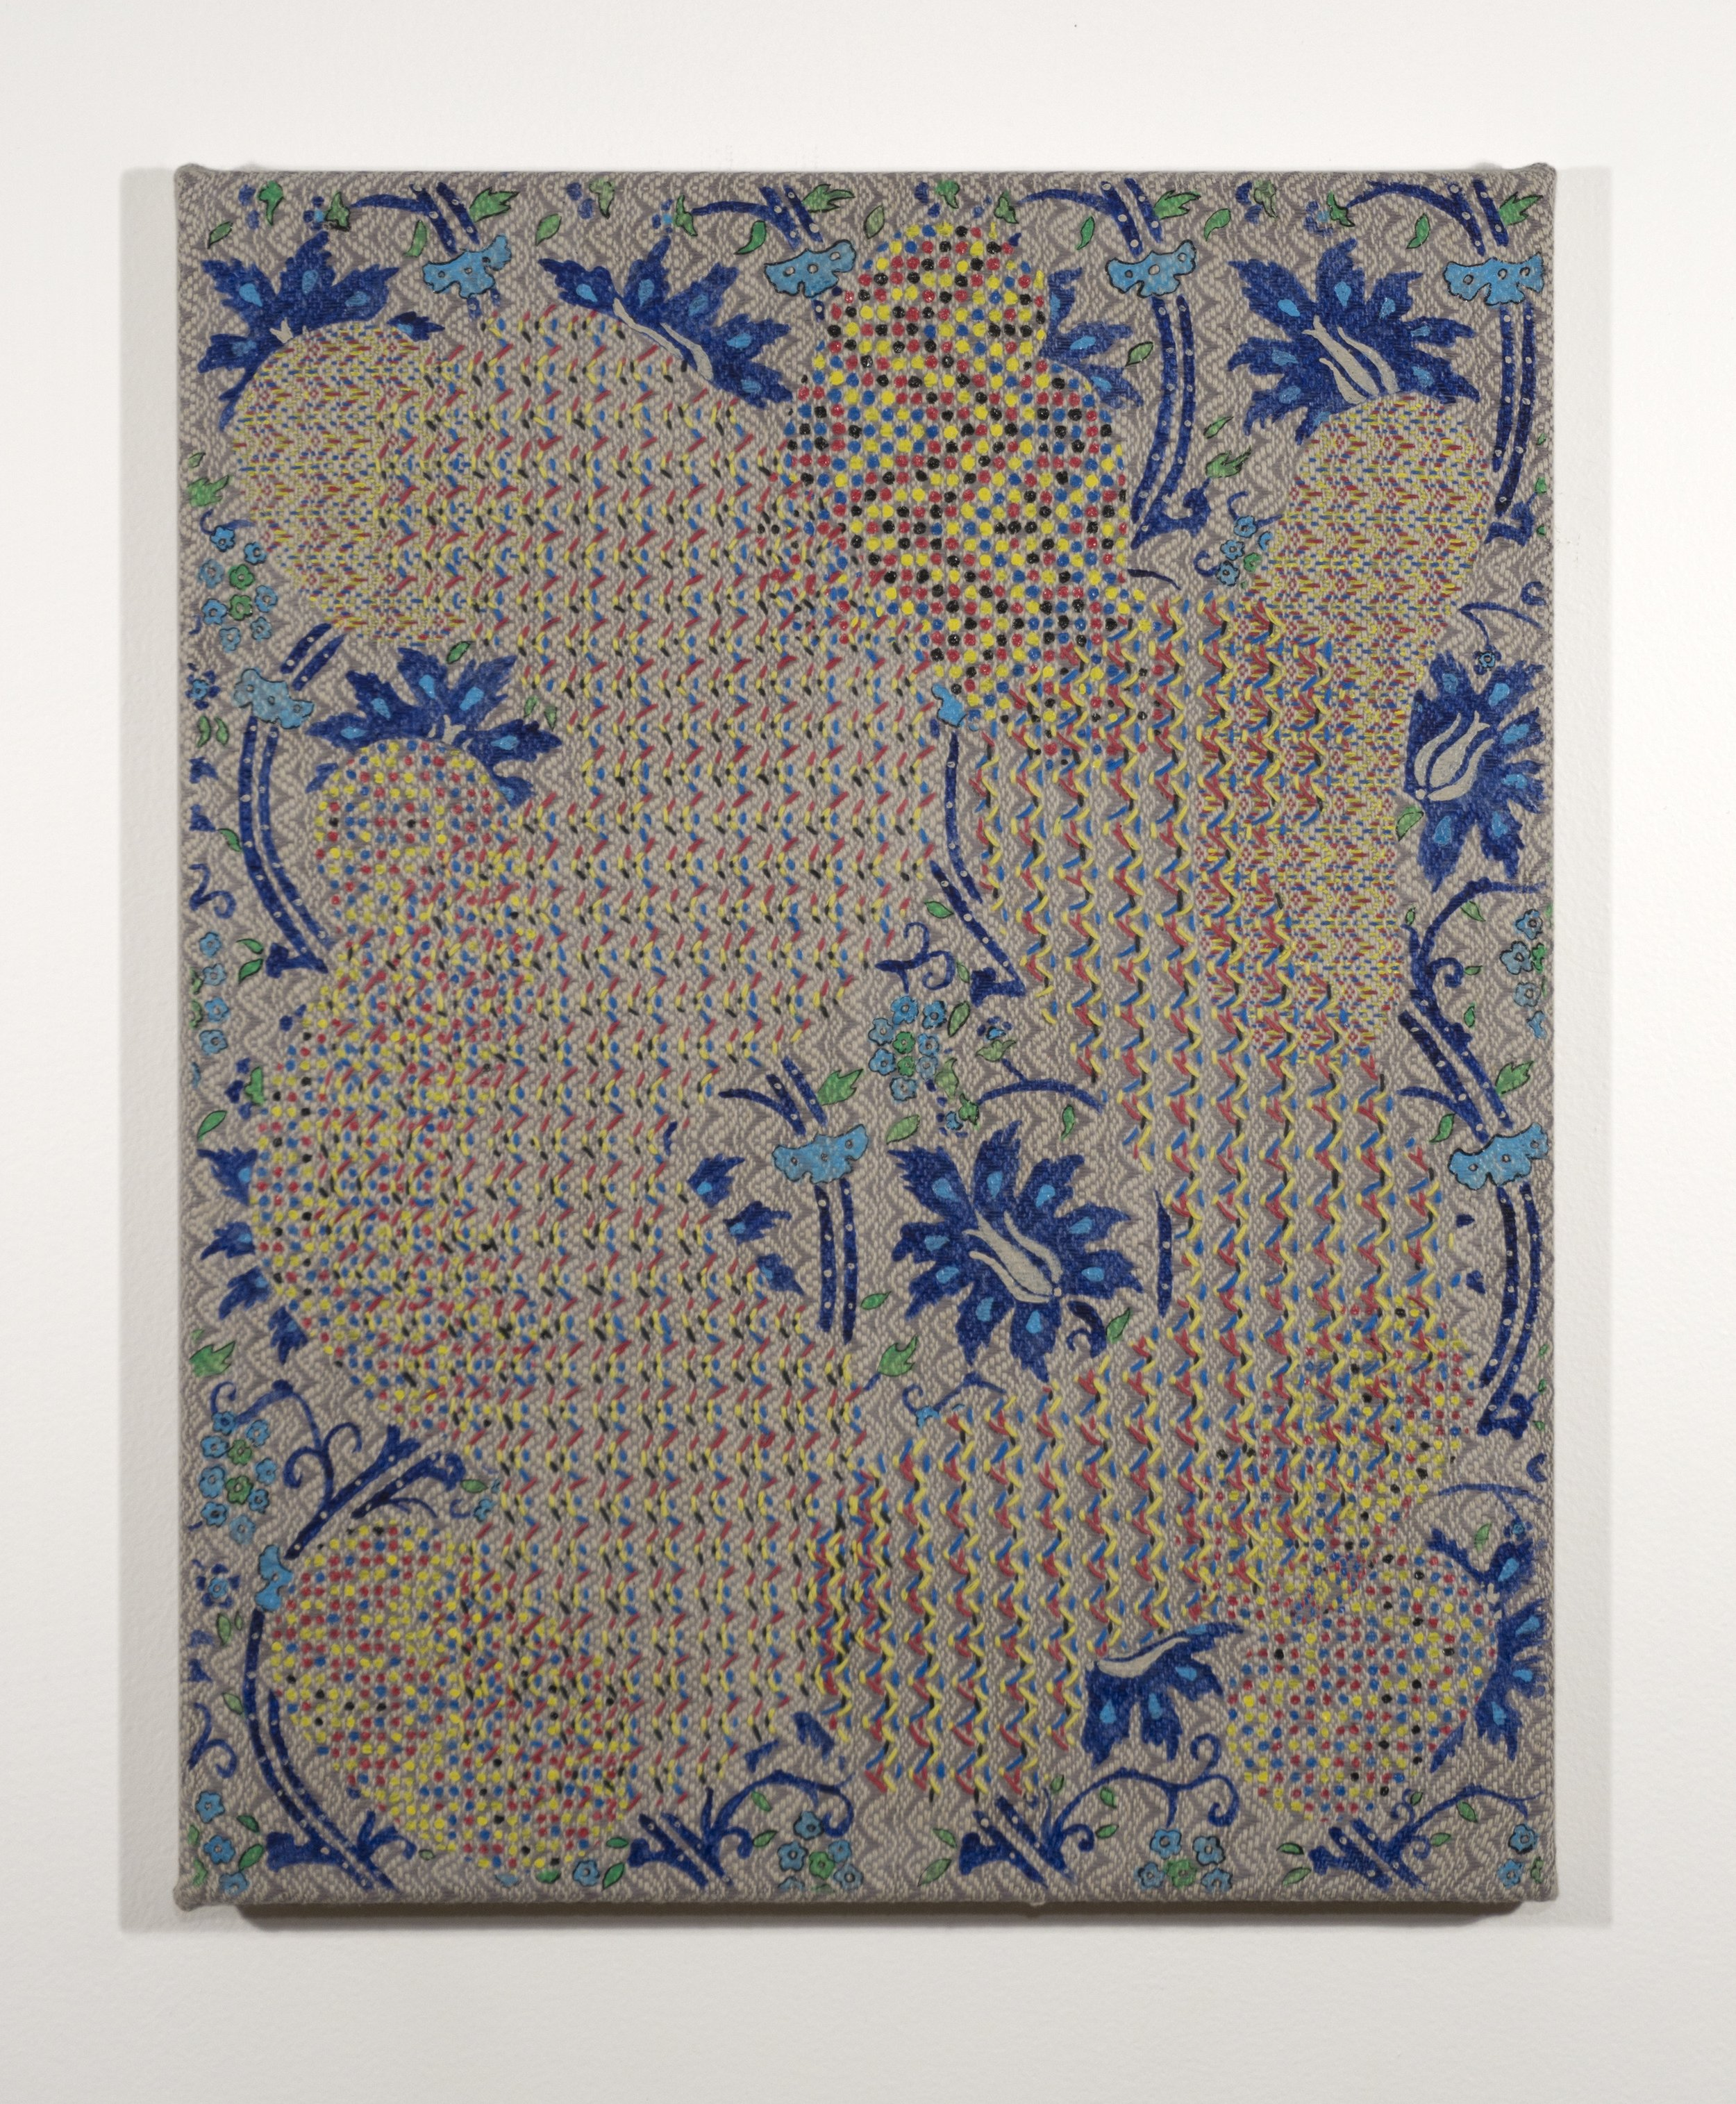 Mark Barrow & Sarah Parke  Origin , 2019 Embroidery and Acrylic on Hand-Loomed Linen 19 ⅝ × 15 ¾ inches (49.85 × 40.01 cm)